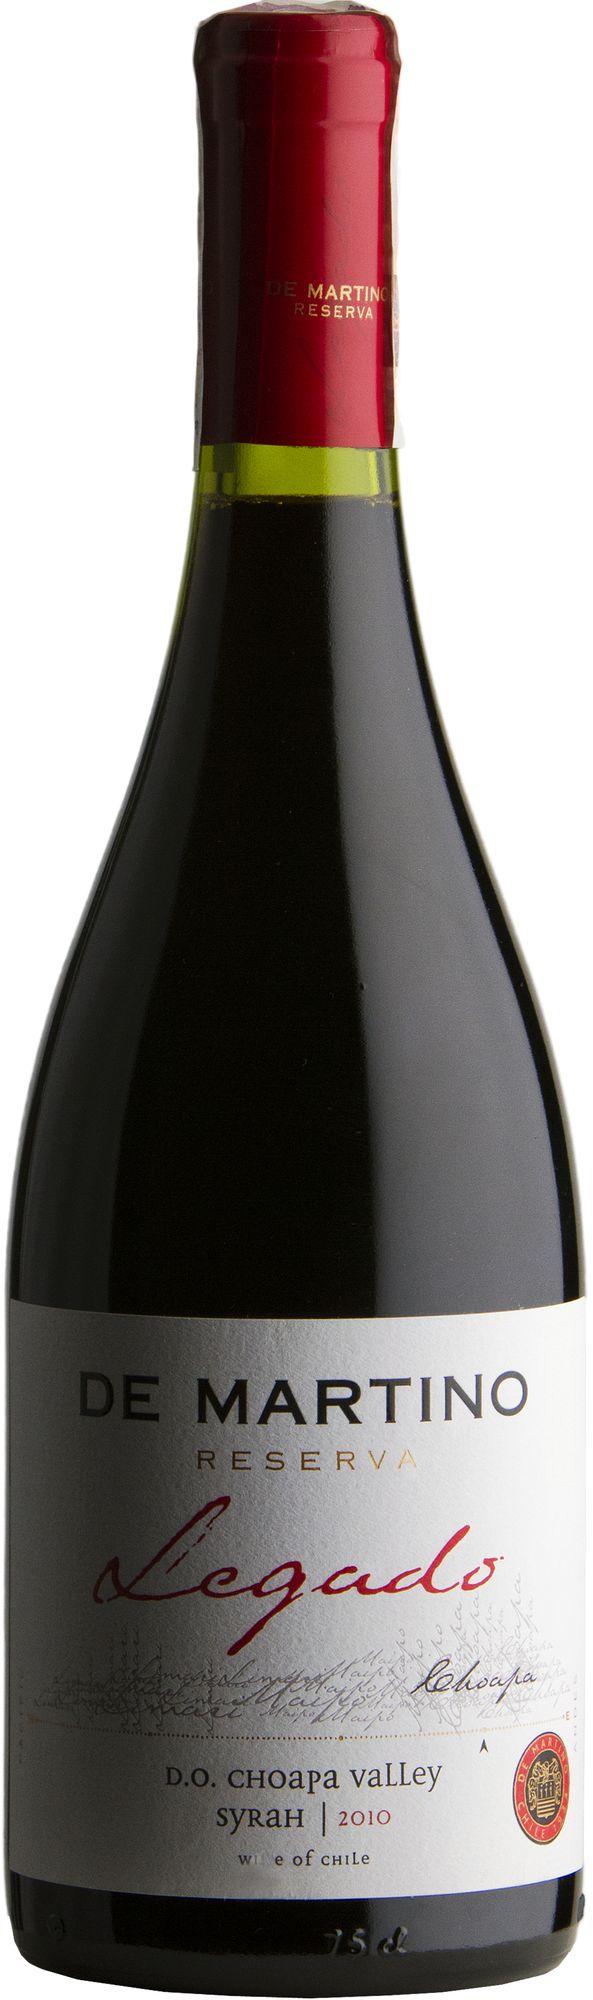 Wino De Martino Legado Syrah Choapa Valley